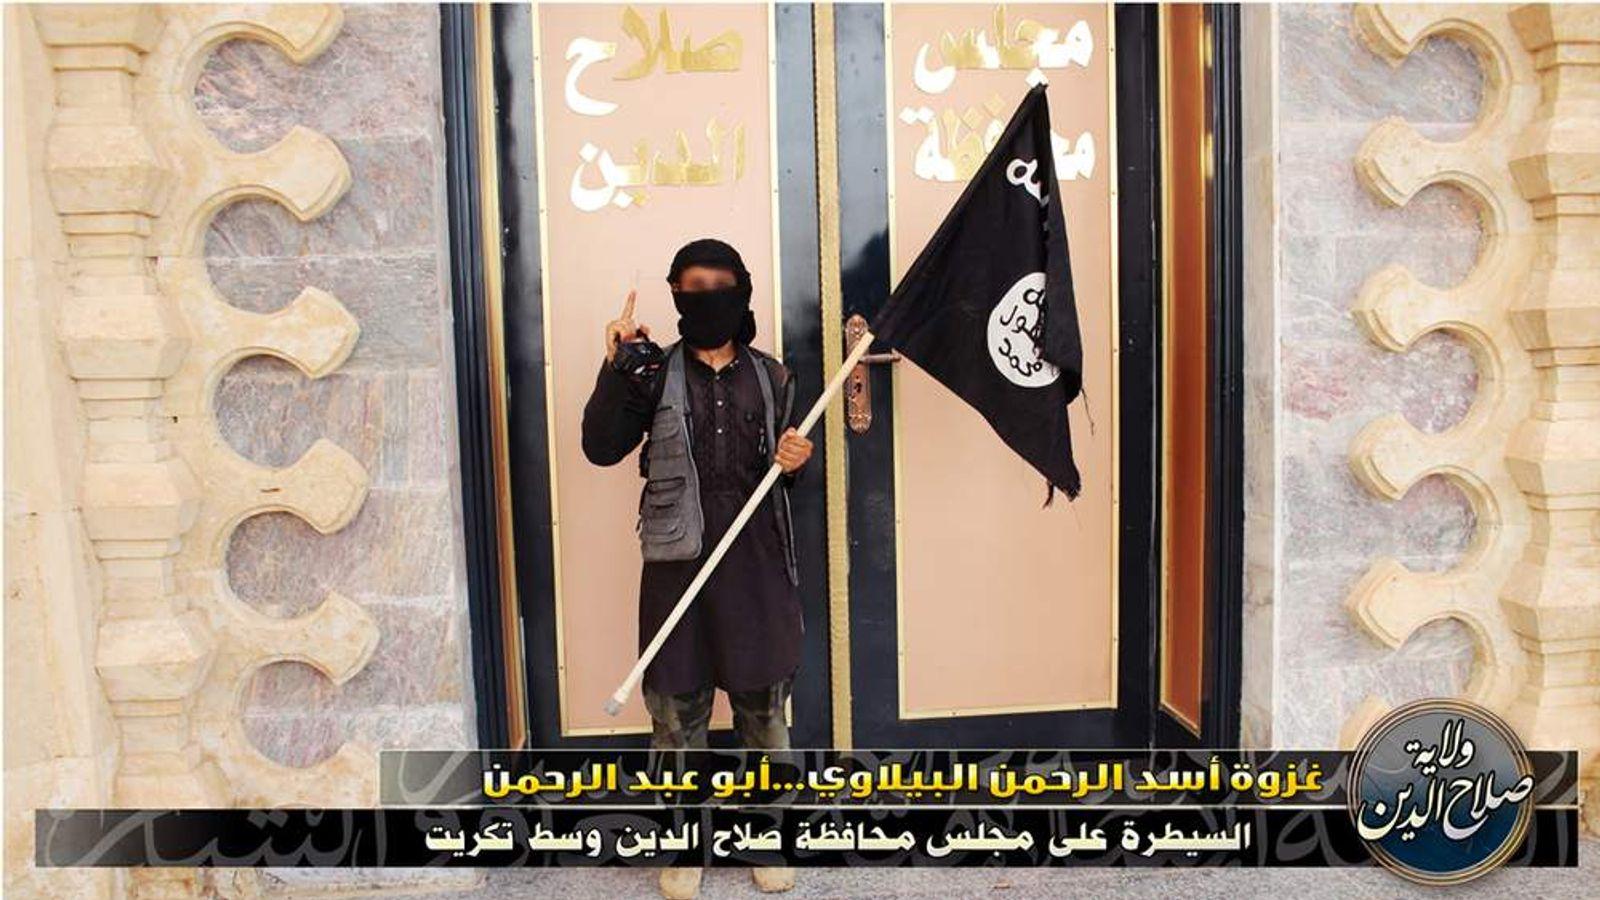 ISIS Militants Massacre Hundreds of Iraqi Soldiers